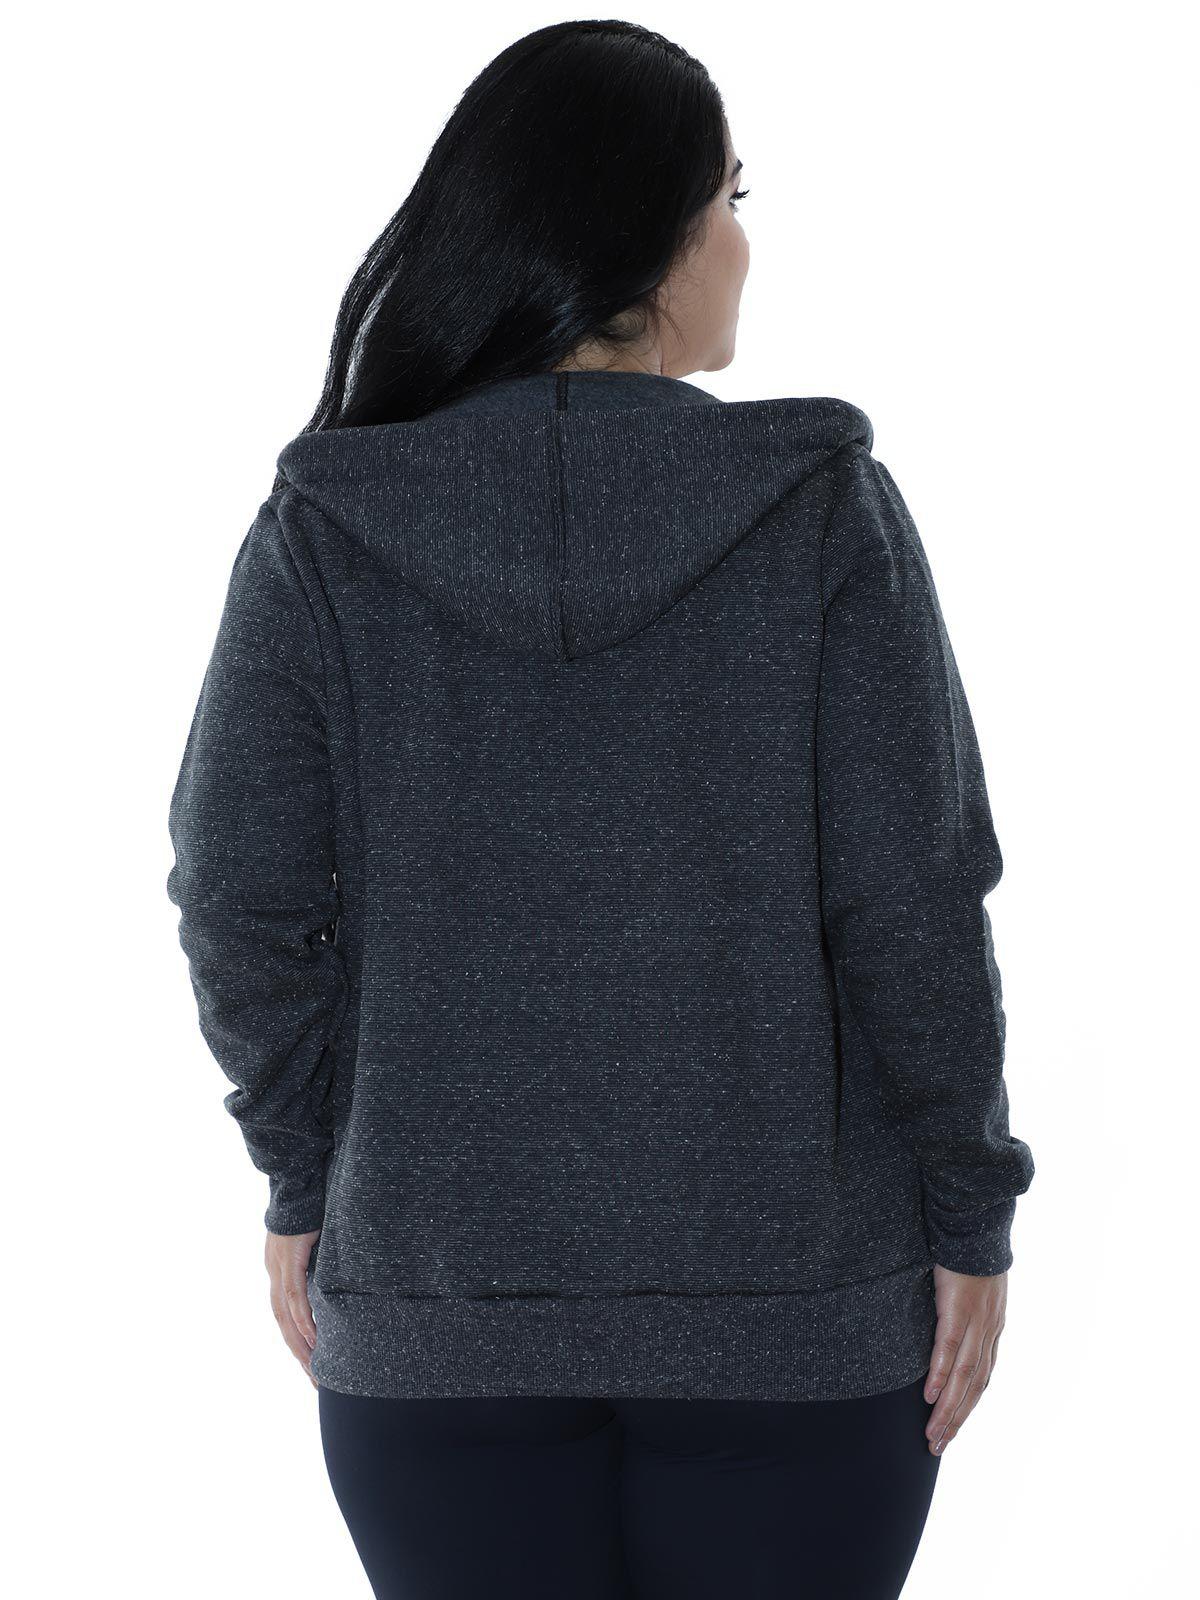 Casaco Plus Size Moletom Fleece Botonê Preto